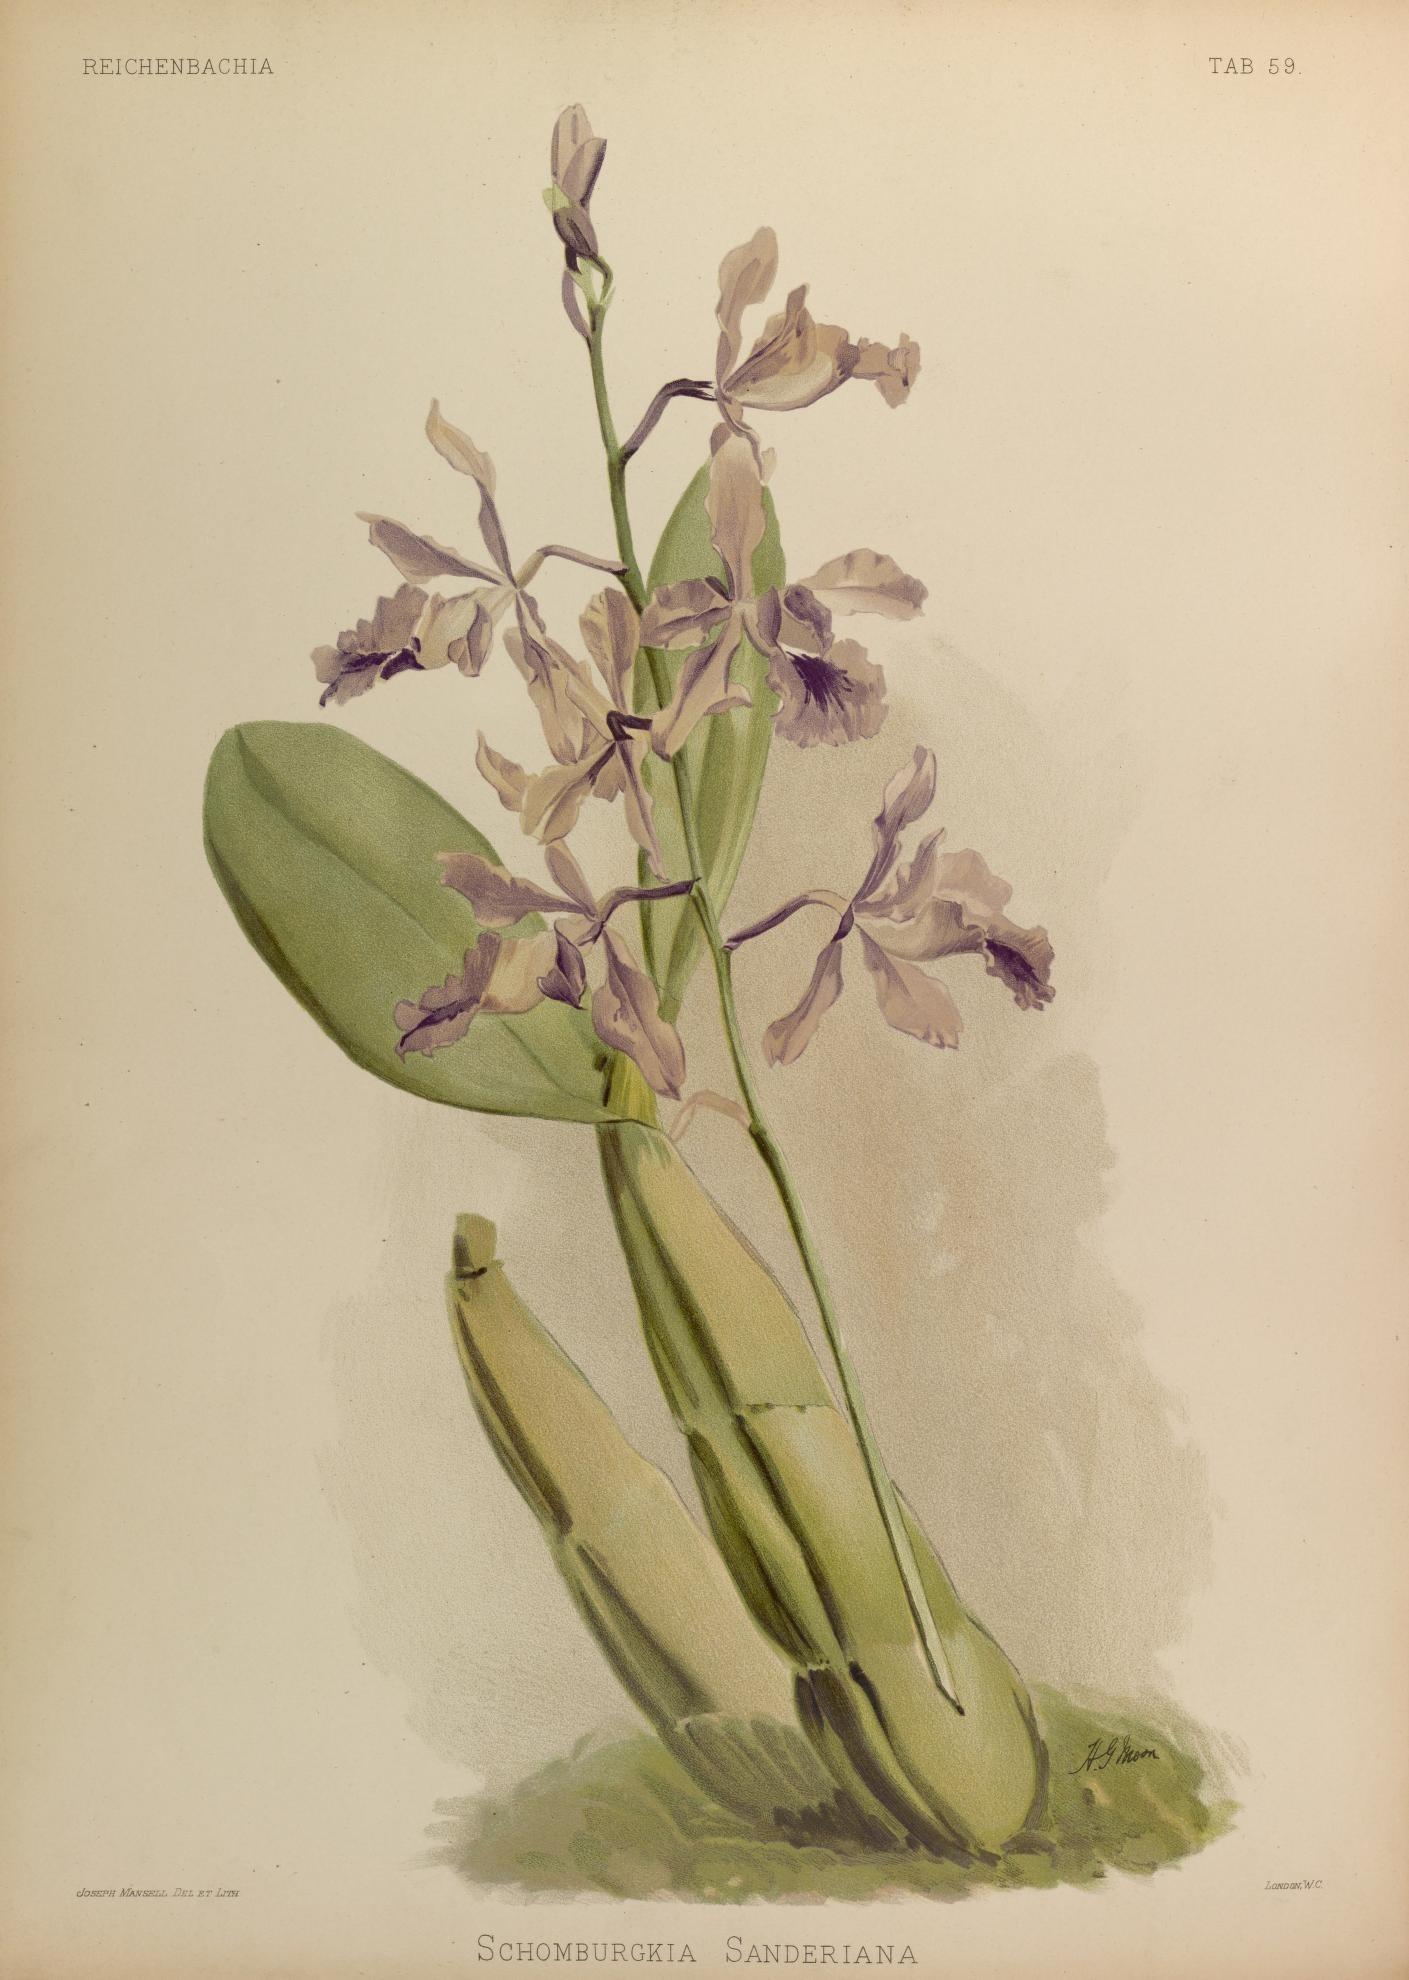 Image of Myrmecophila